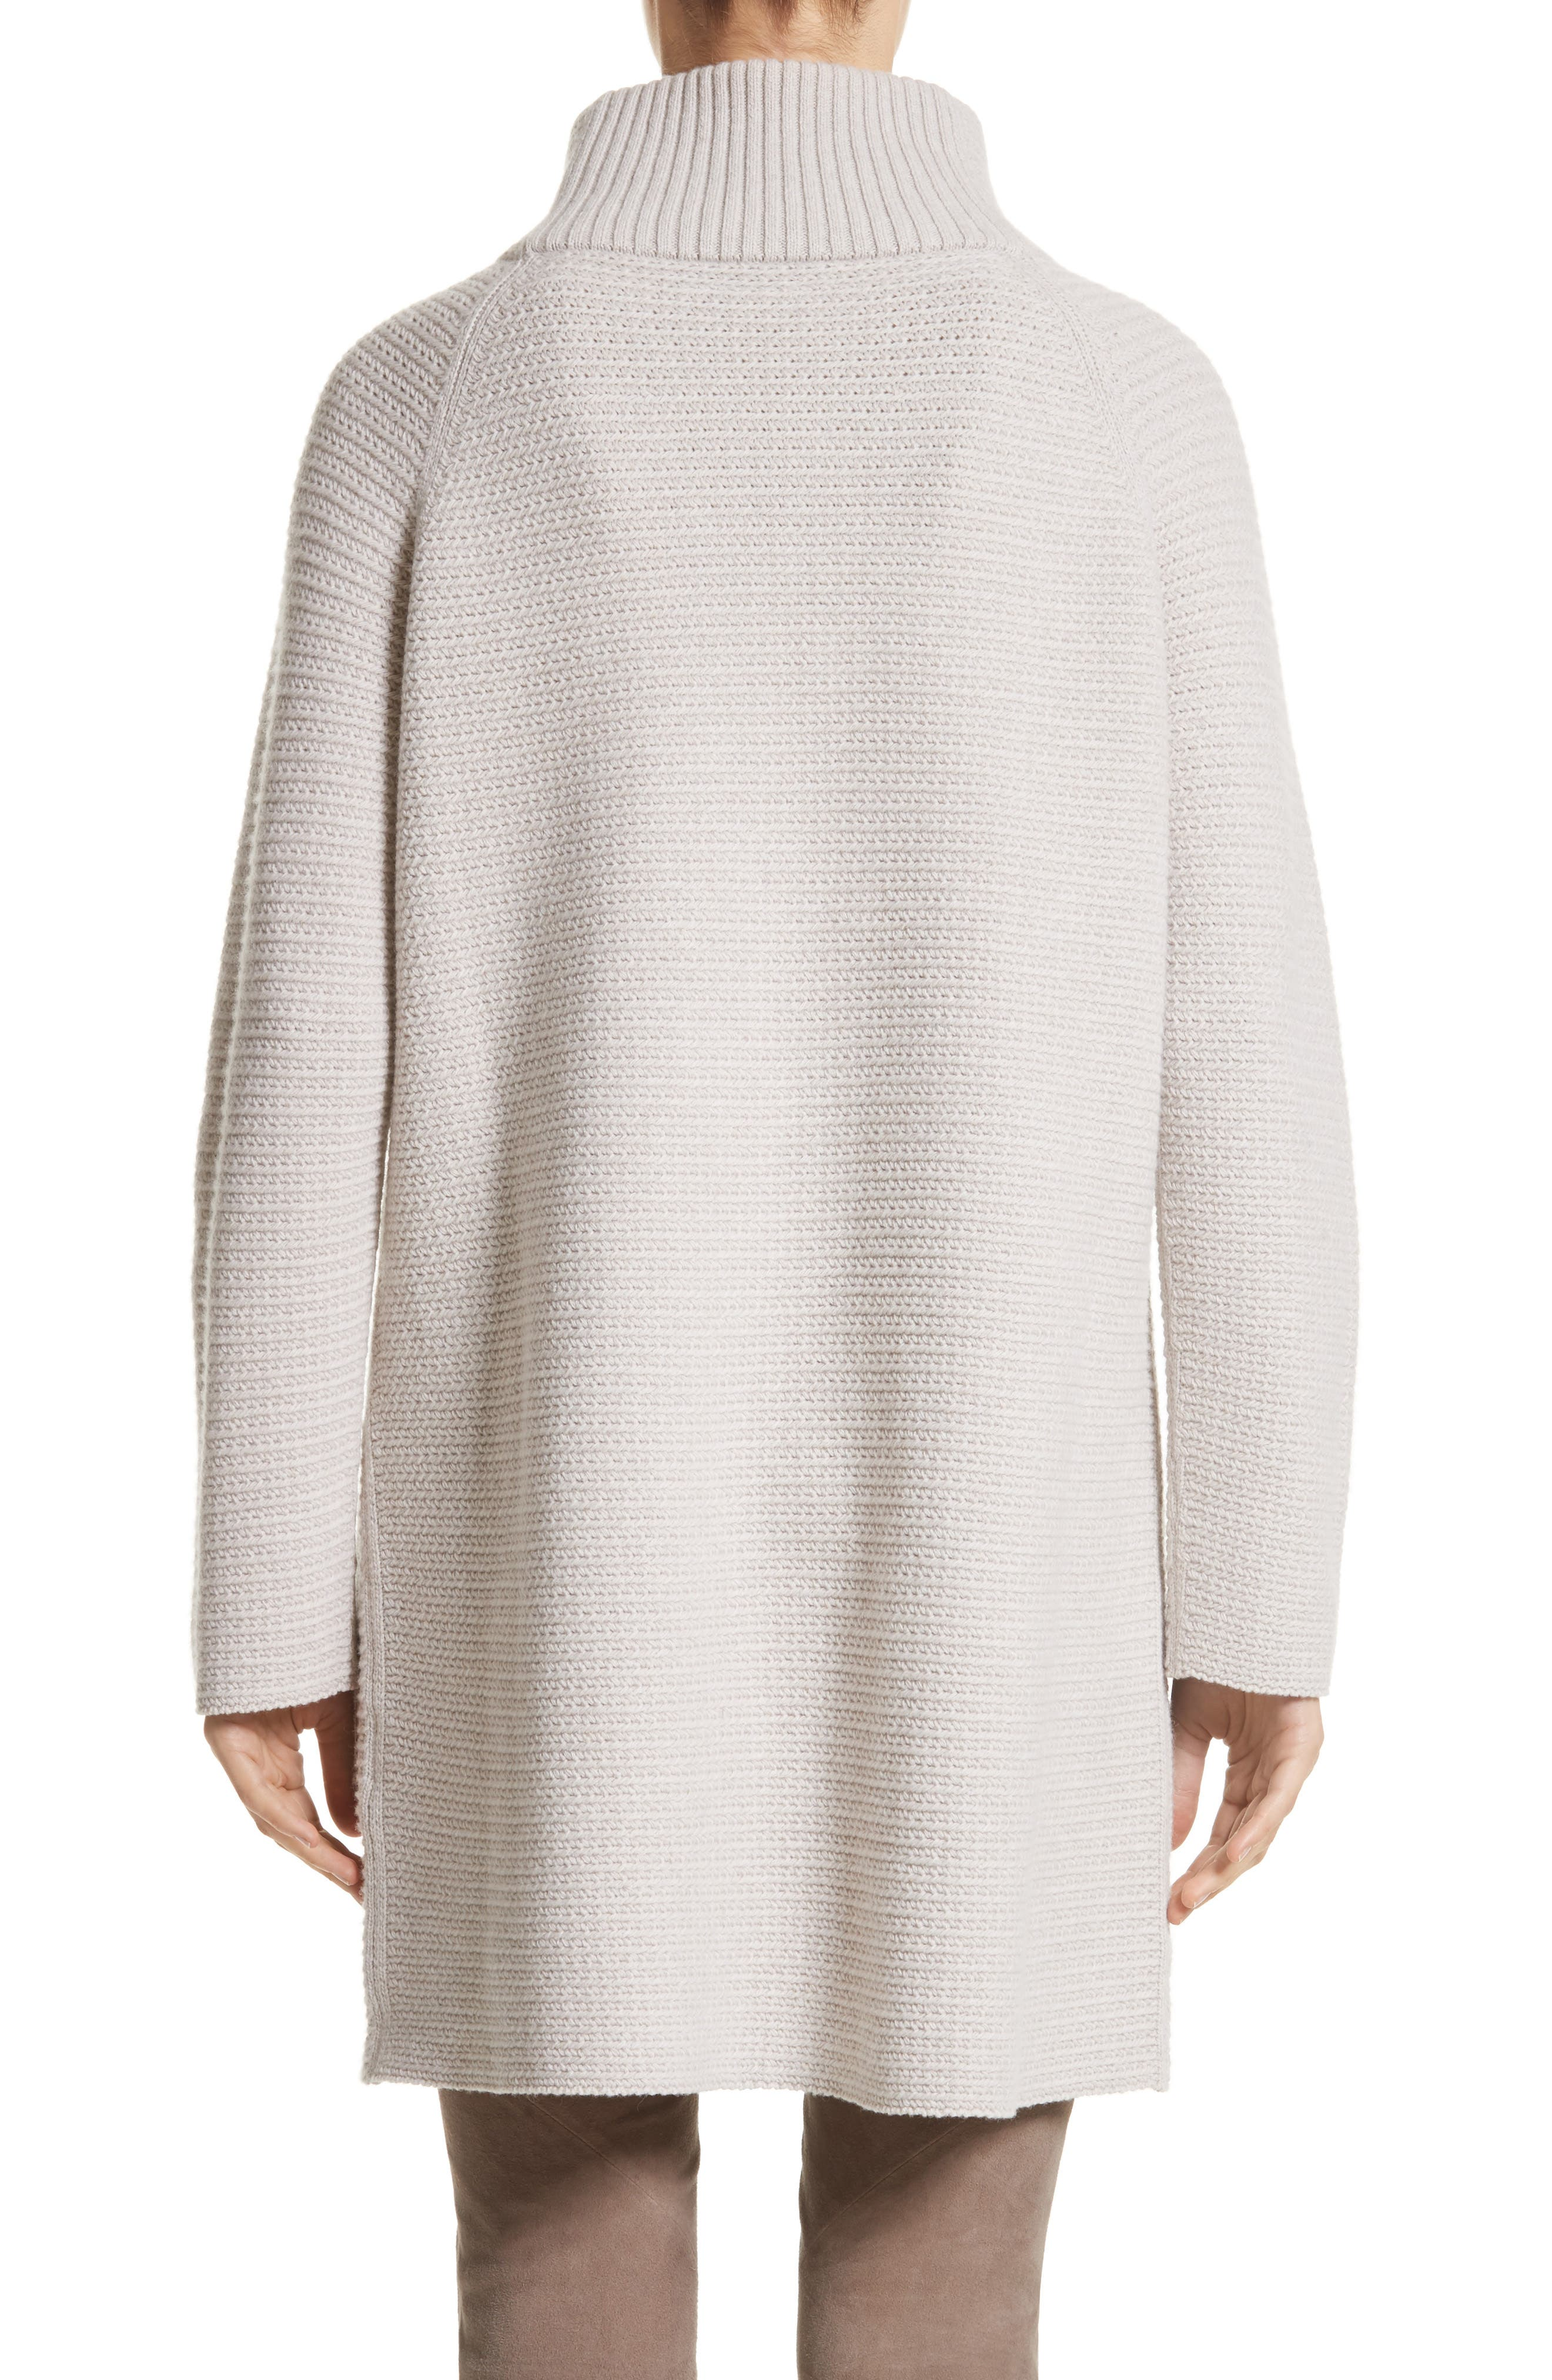 Alternate Image 2  - Lafayette 148 New York Wool & Cashmere Herringbone Stitch Cardigan with Genuine Shearling Pockets